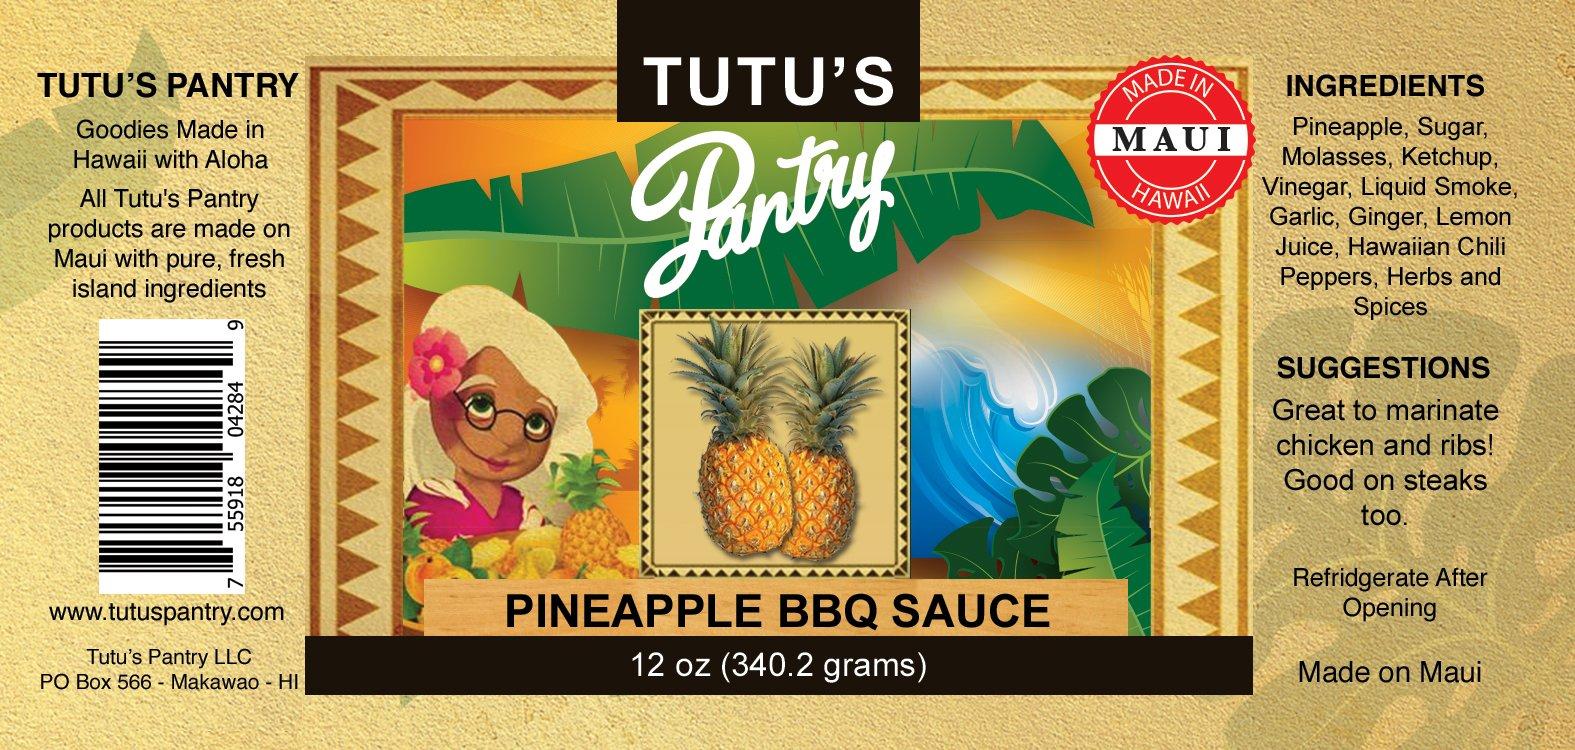 pineapple bbq sauce label